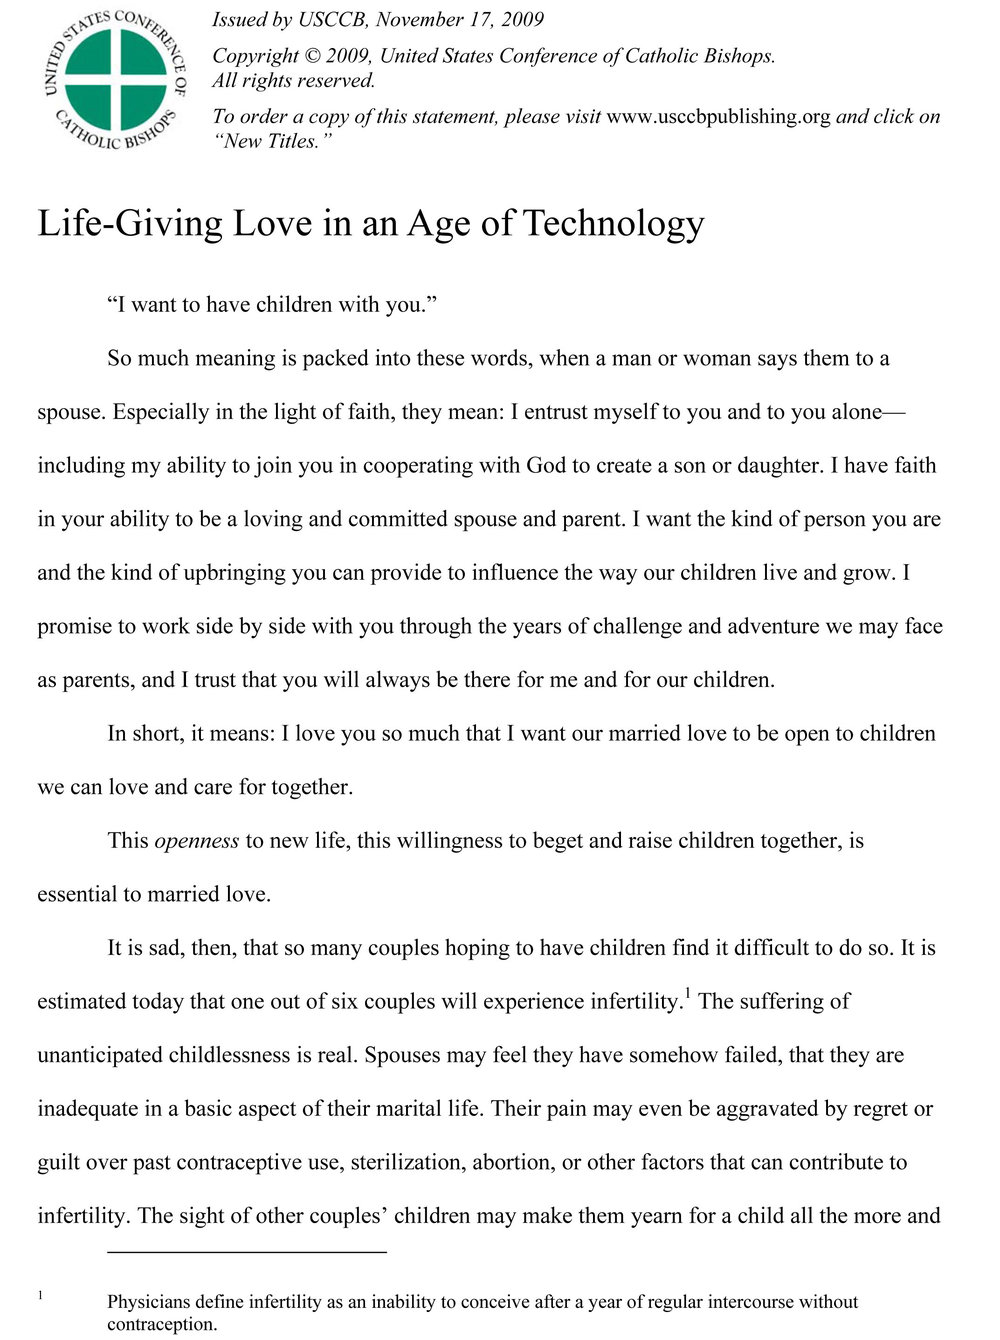 lifegiving-love-age-technology-2009-1.jpg